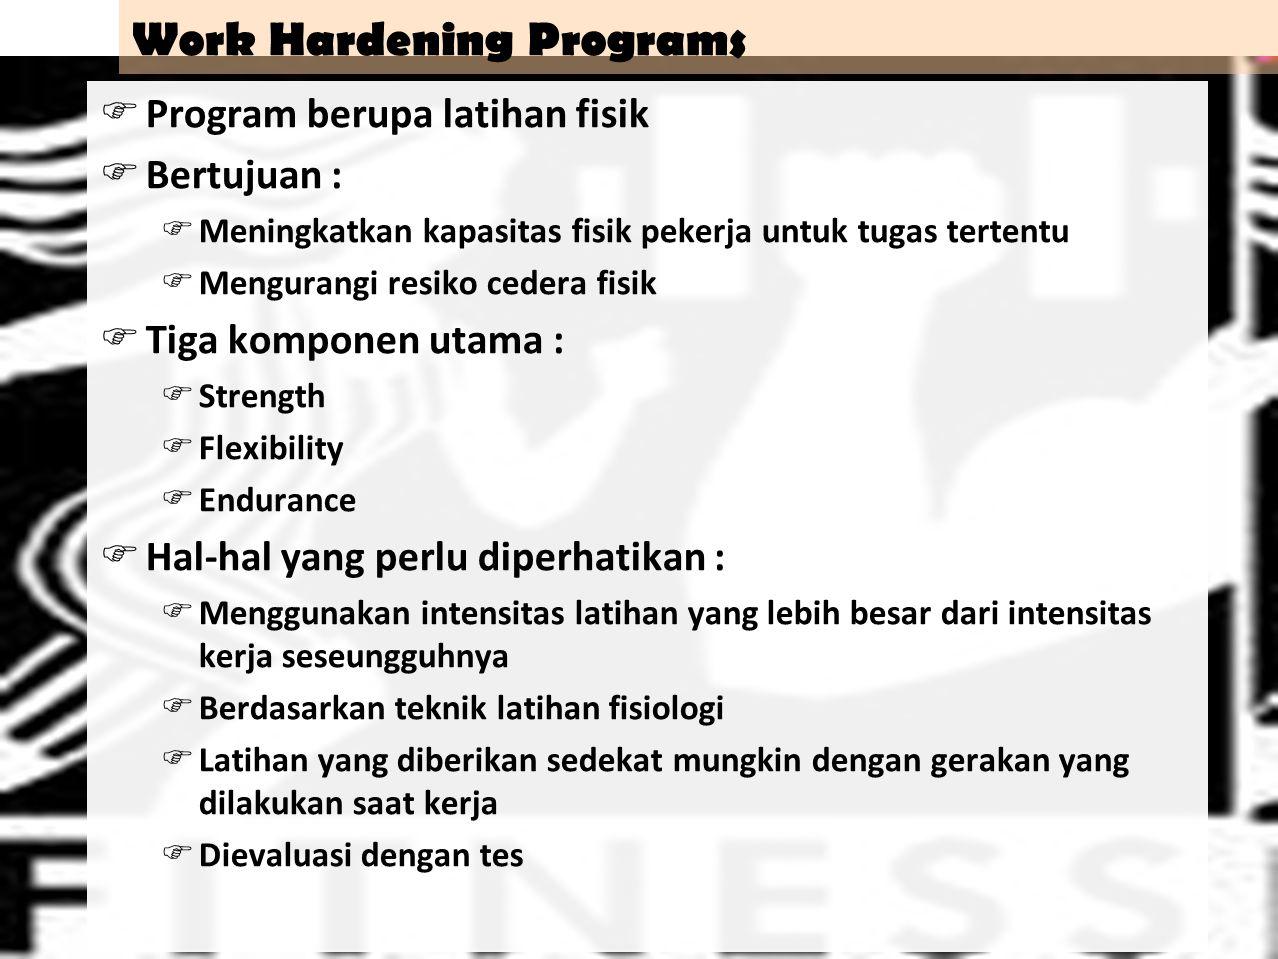 Work Hardening Programs